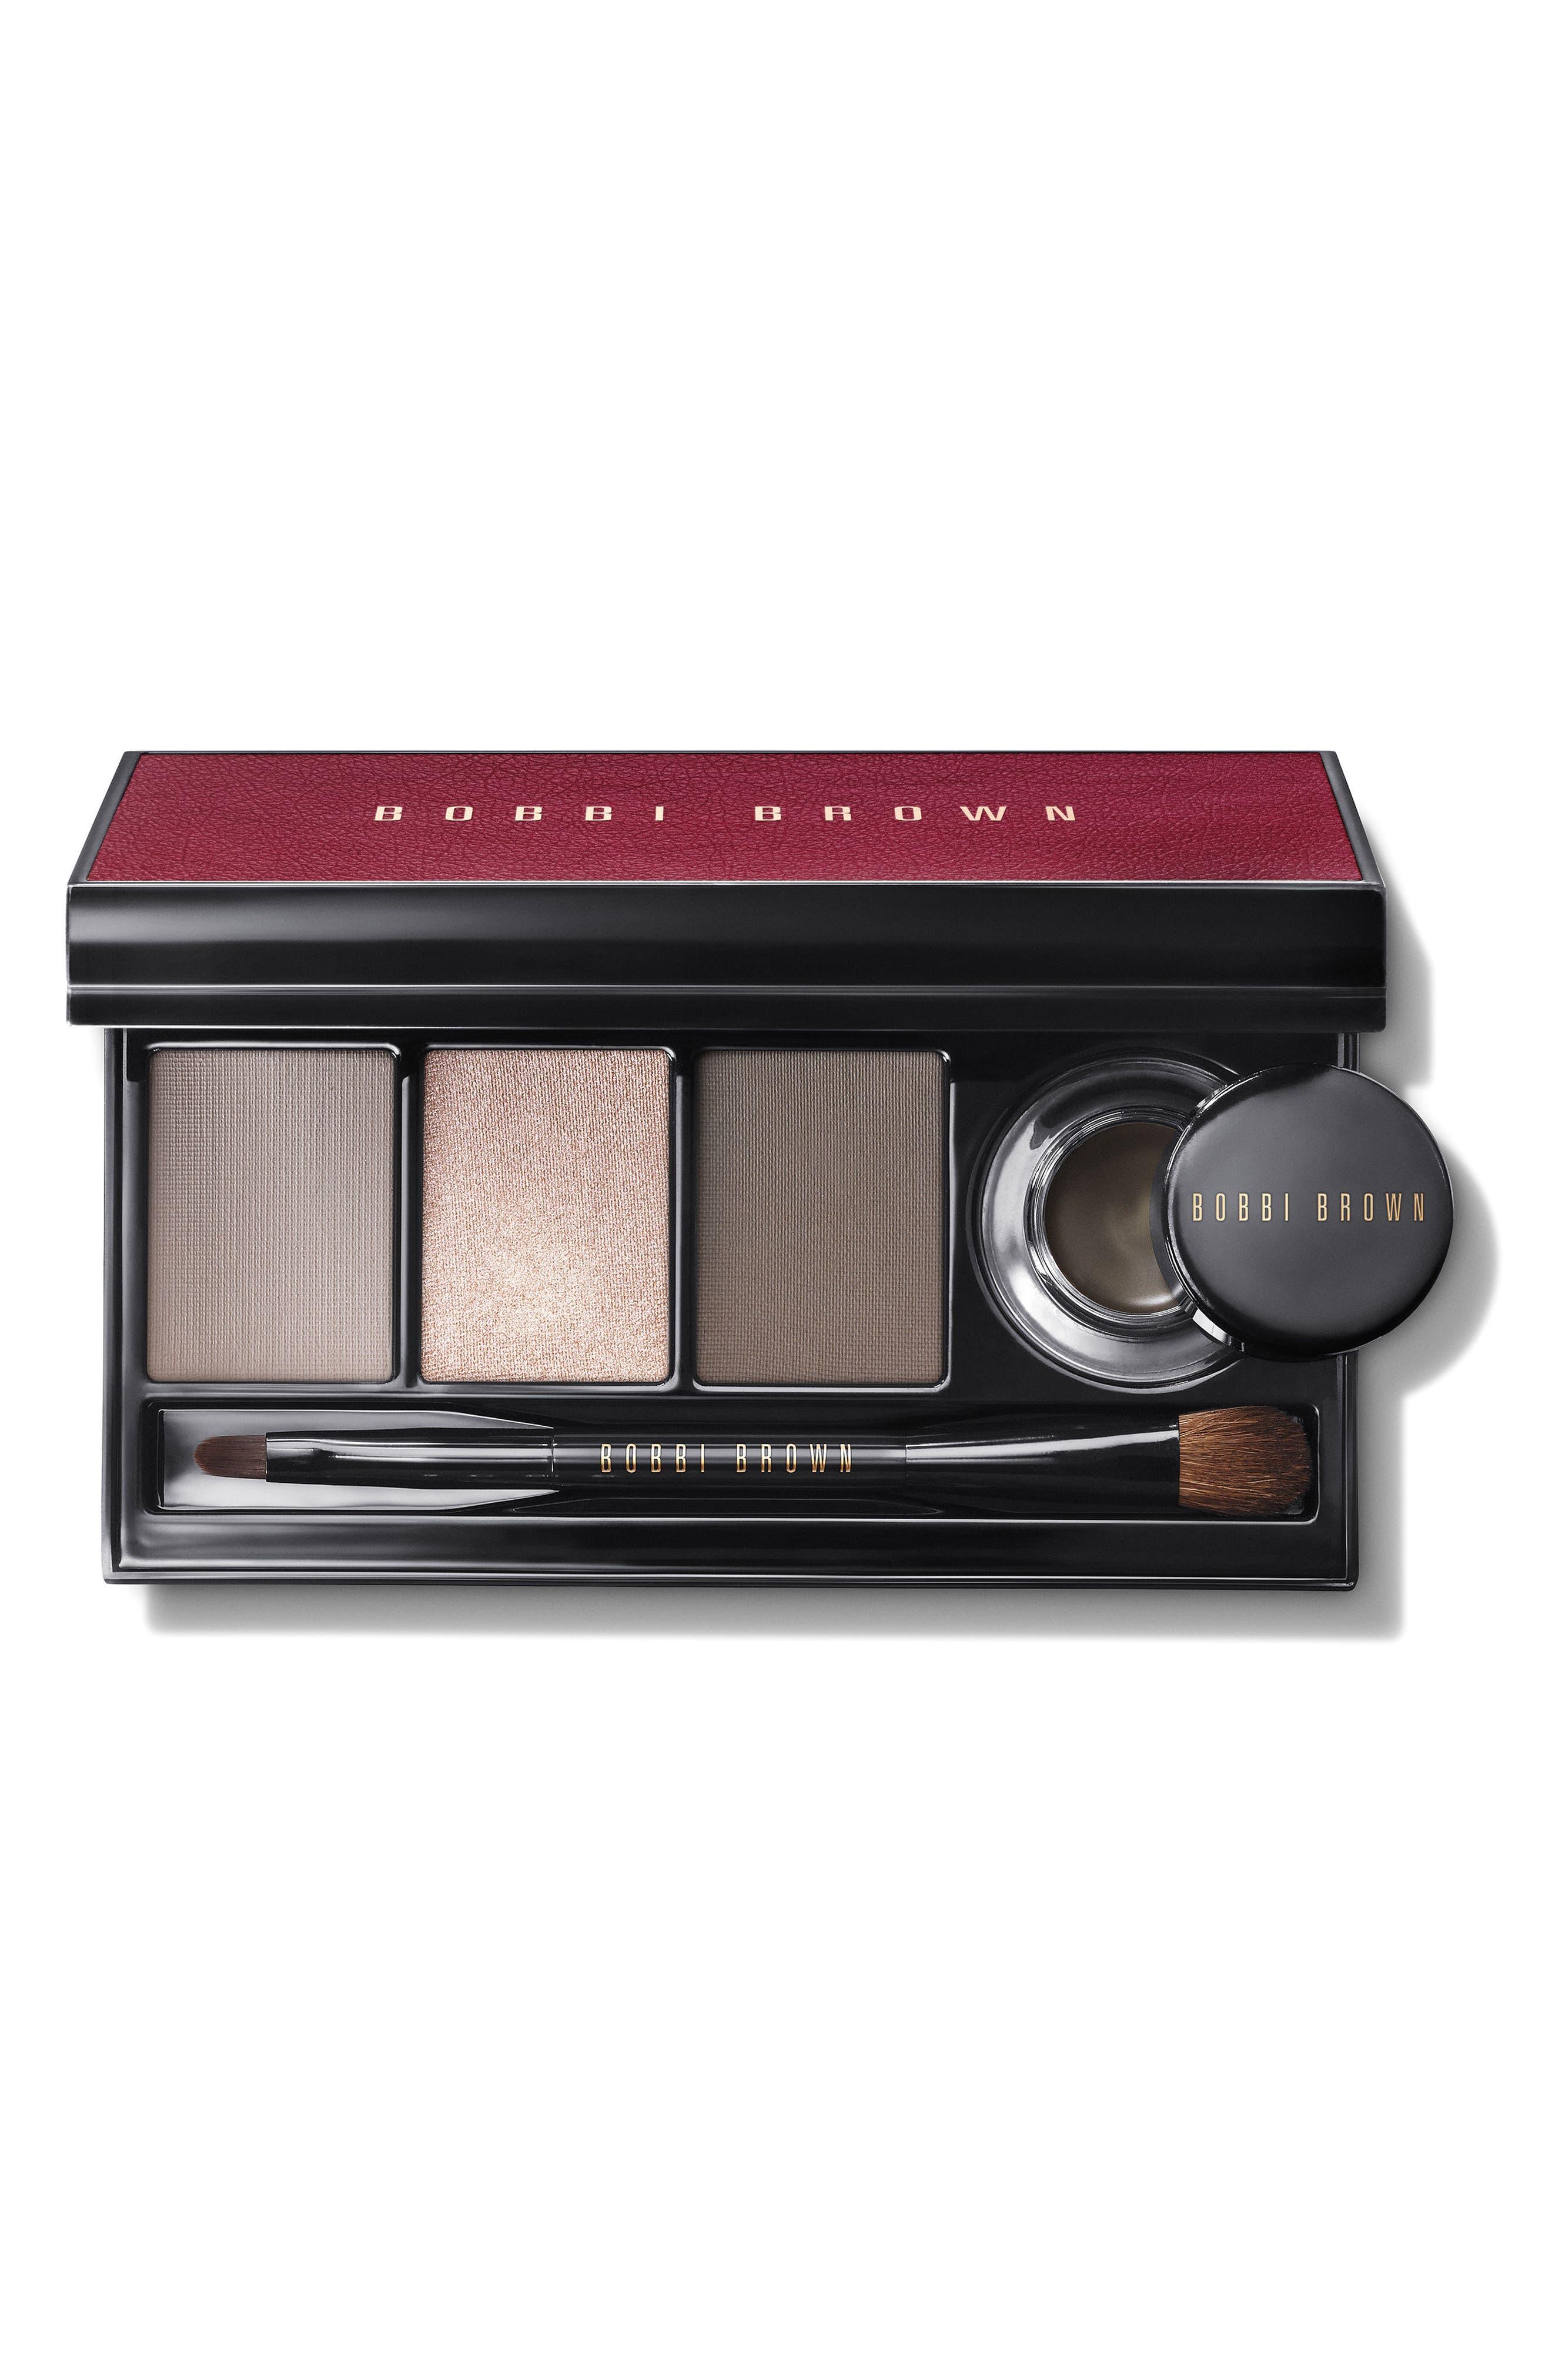 Satin & Caviar Eyeshadow & Long-Wear Gel Eyeliner Palette,                             Main thumbnail 1, color,                             No Color